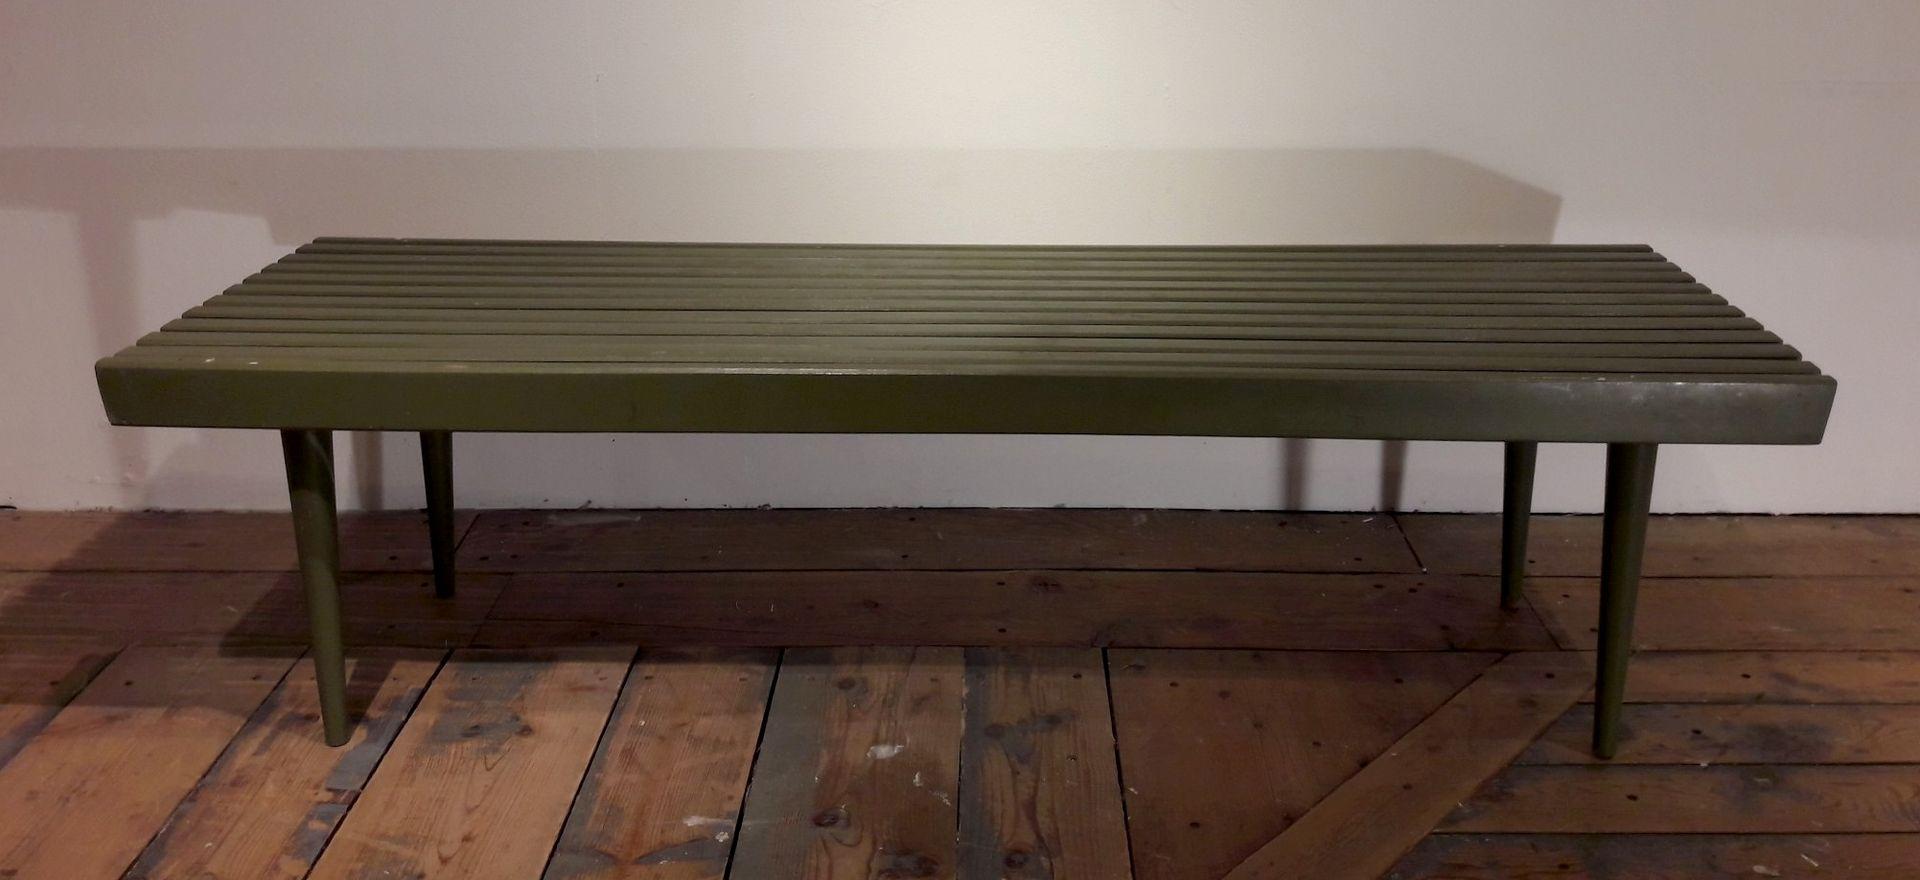 table basse vintage en bois peint vert tats unis en vente sur pamono. Black Bedroom Furniture Sets. Home Design Ideas